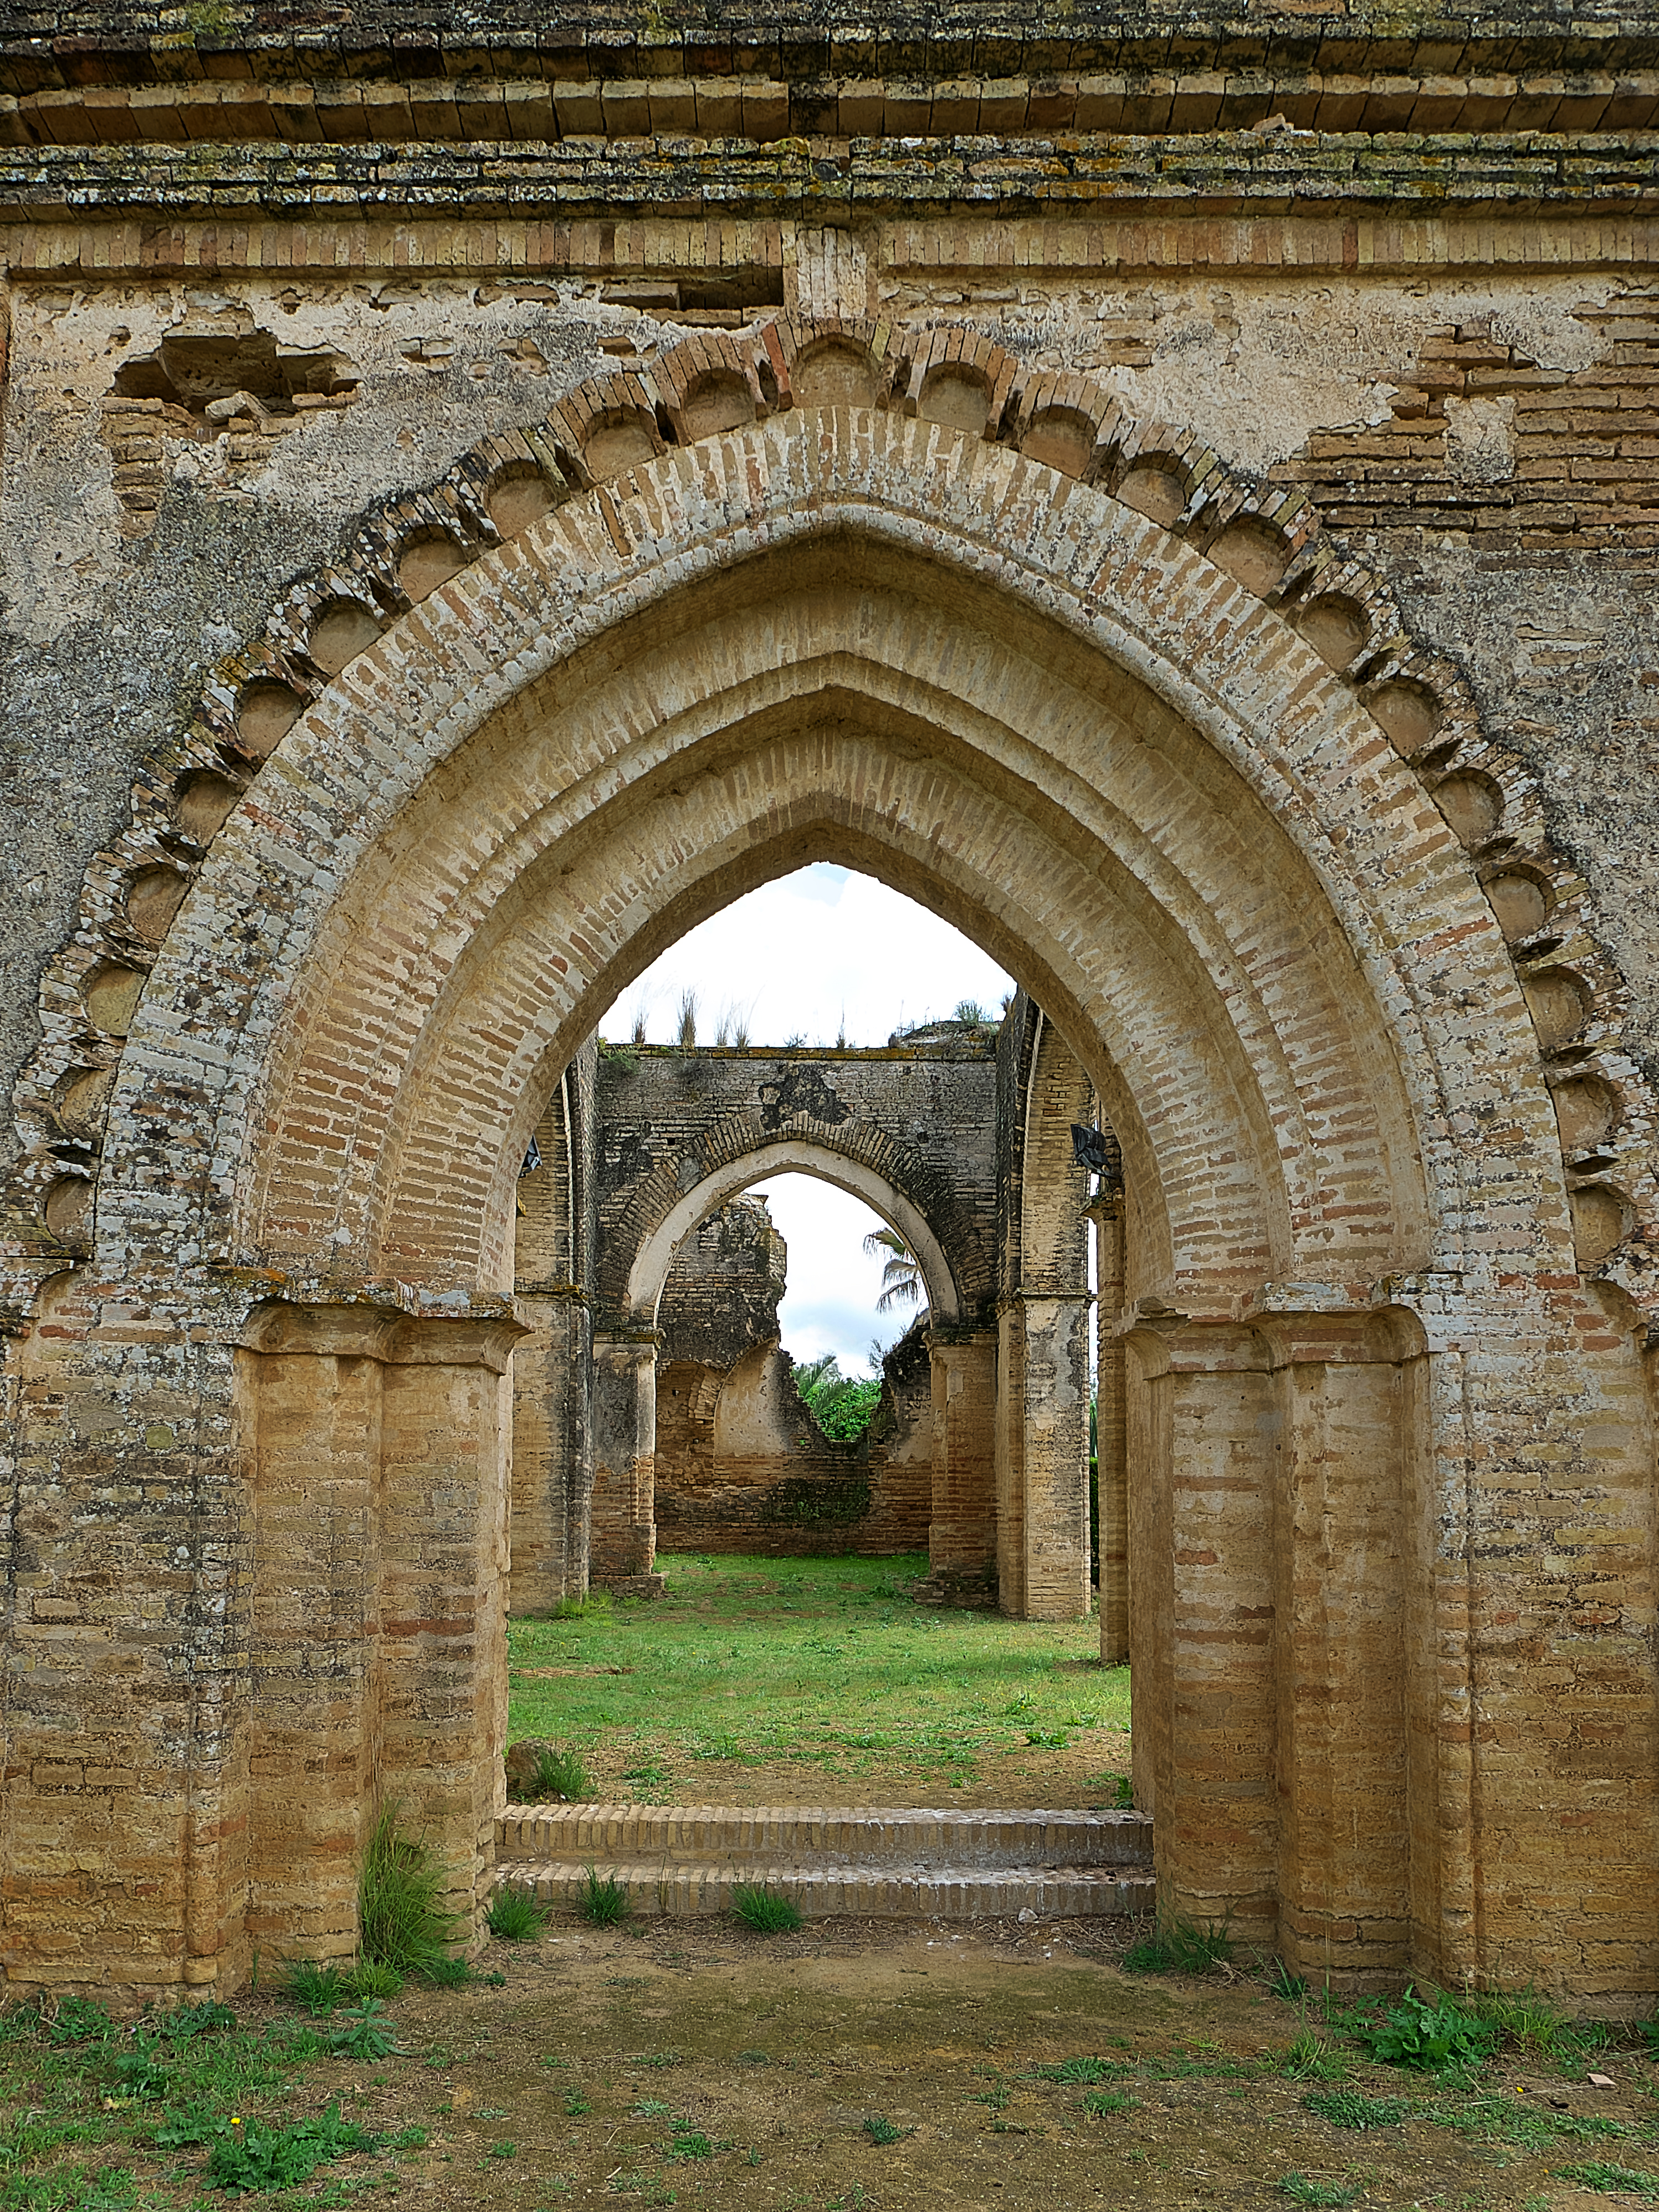 Archivo ermita de castilleja de talhara benacaz n portal for N portal